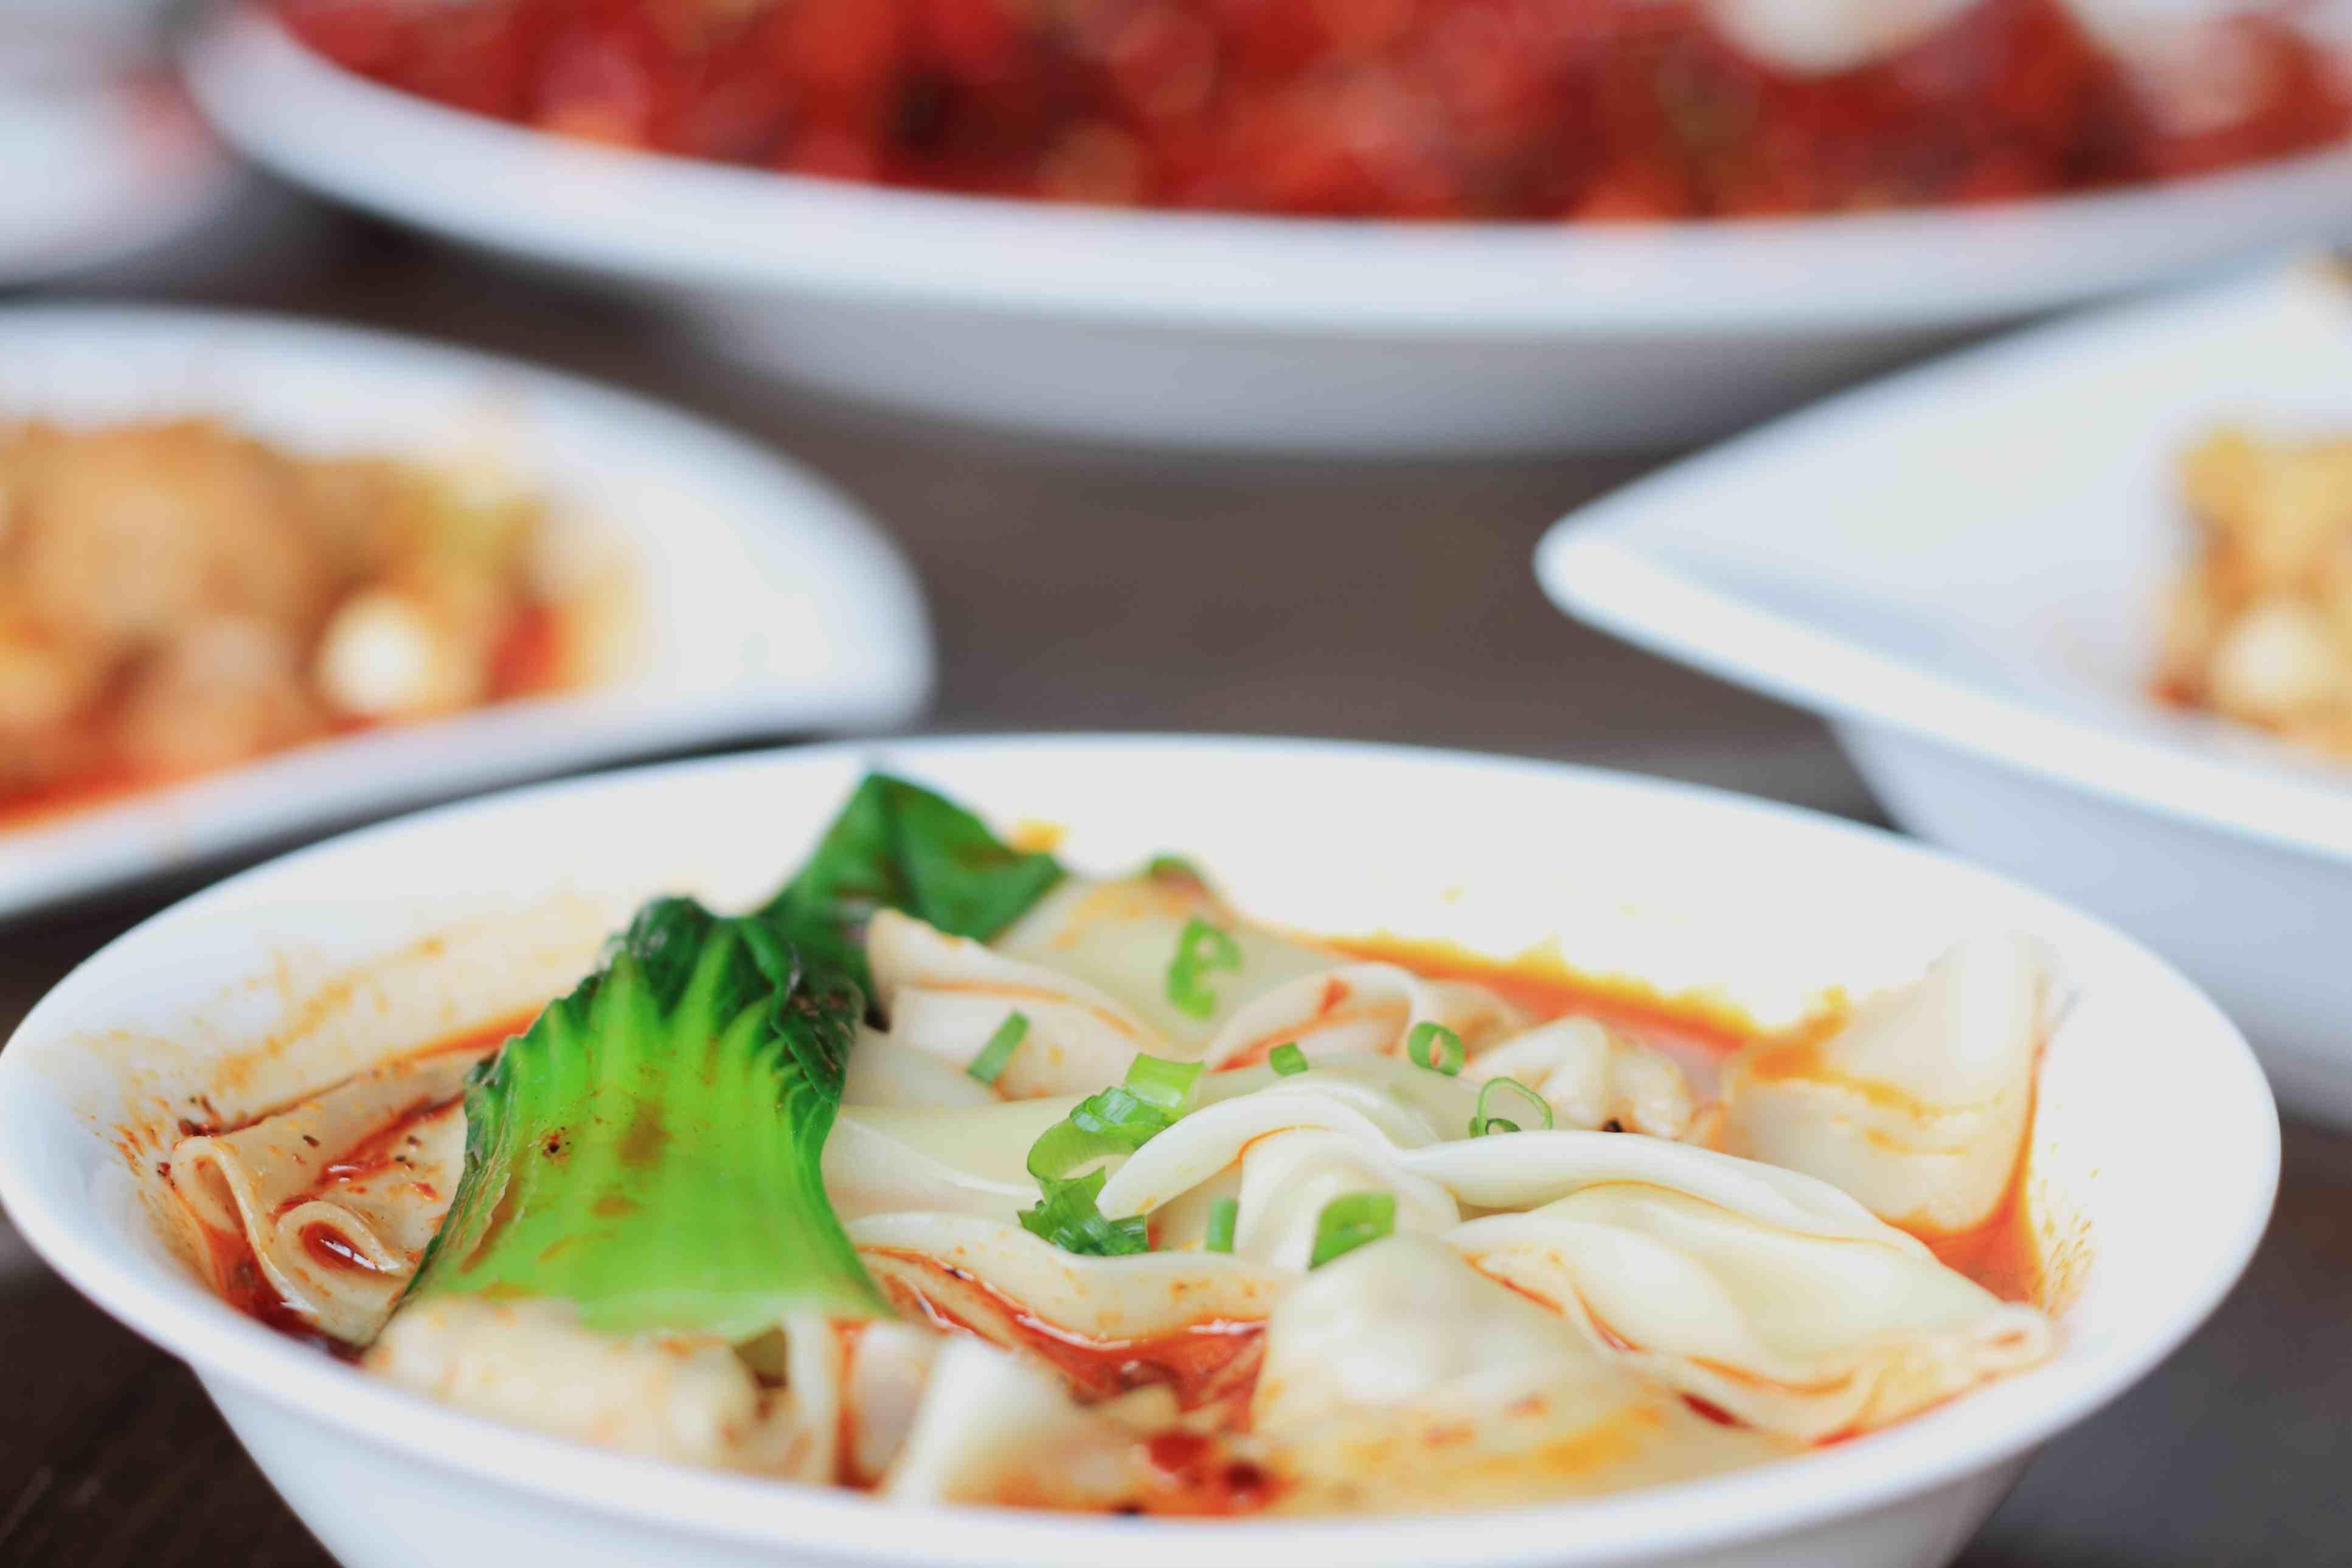 Bowl of szechuan dumplings soup